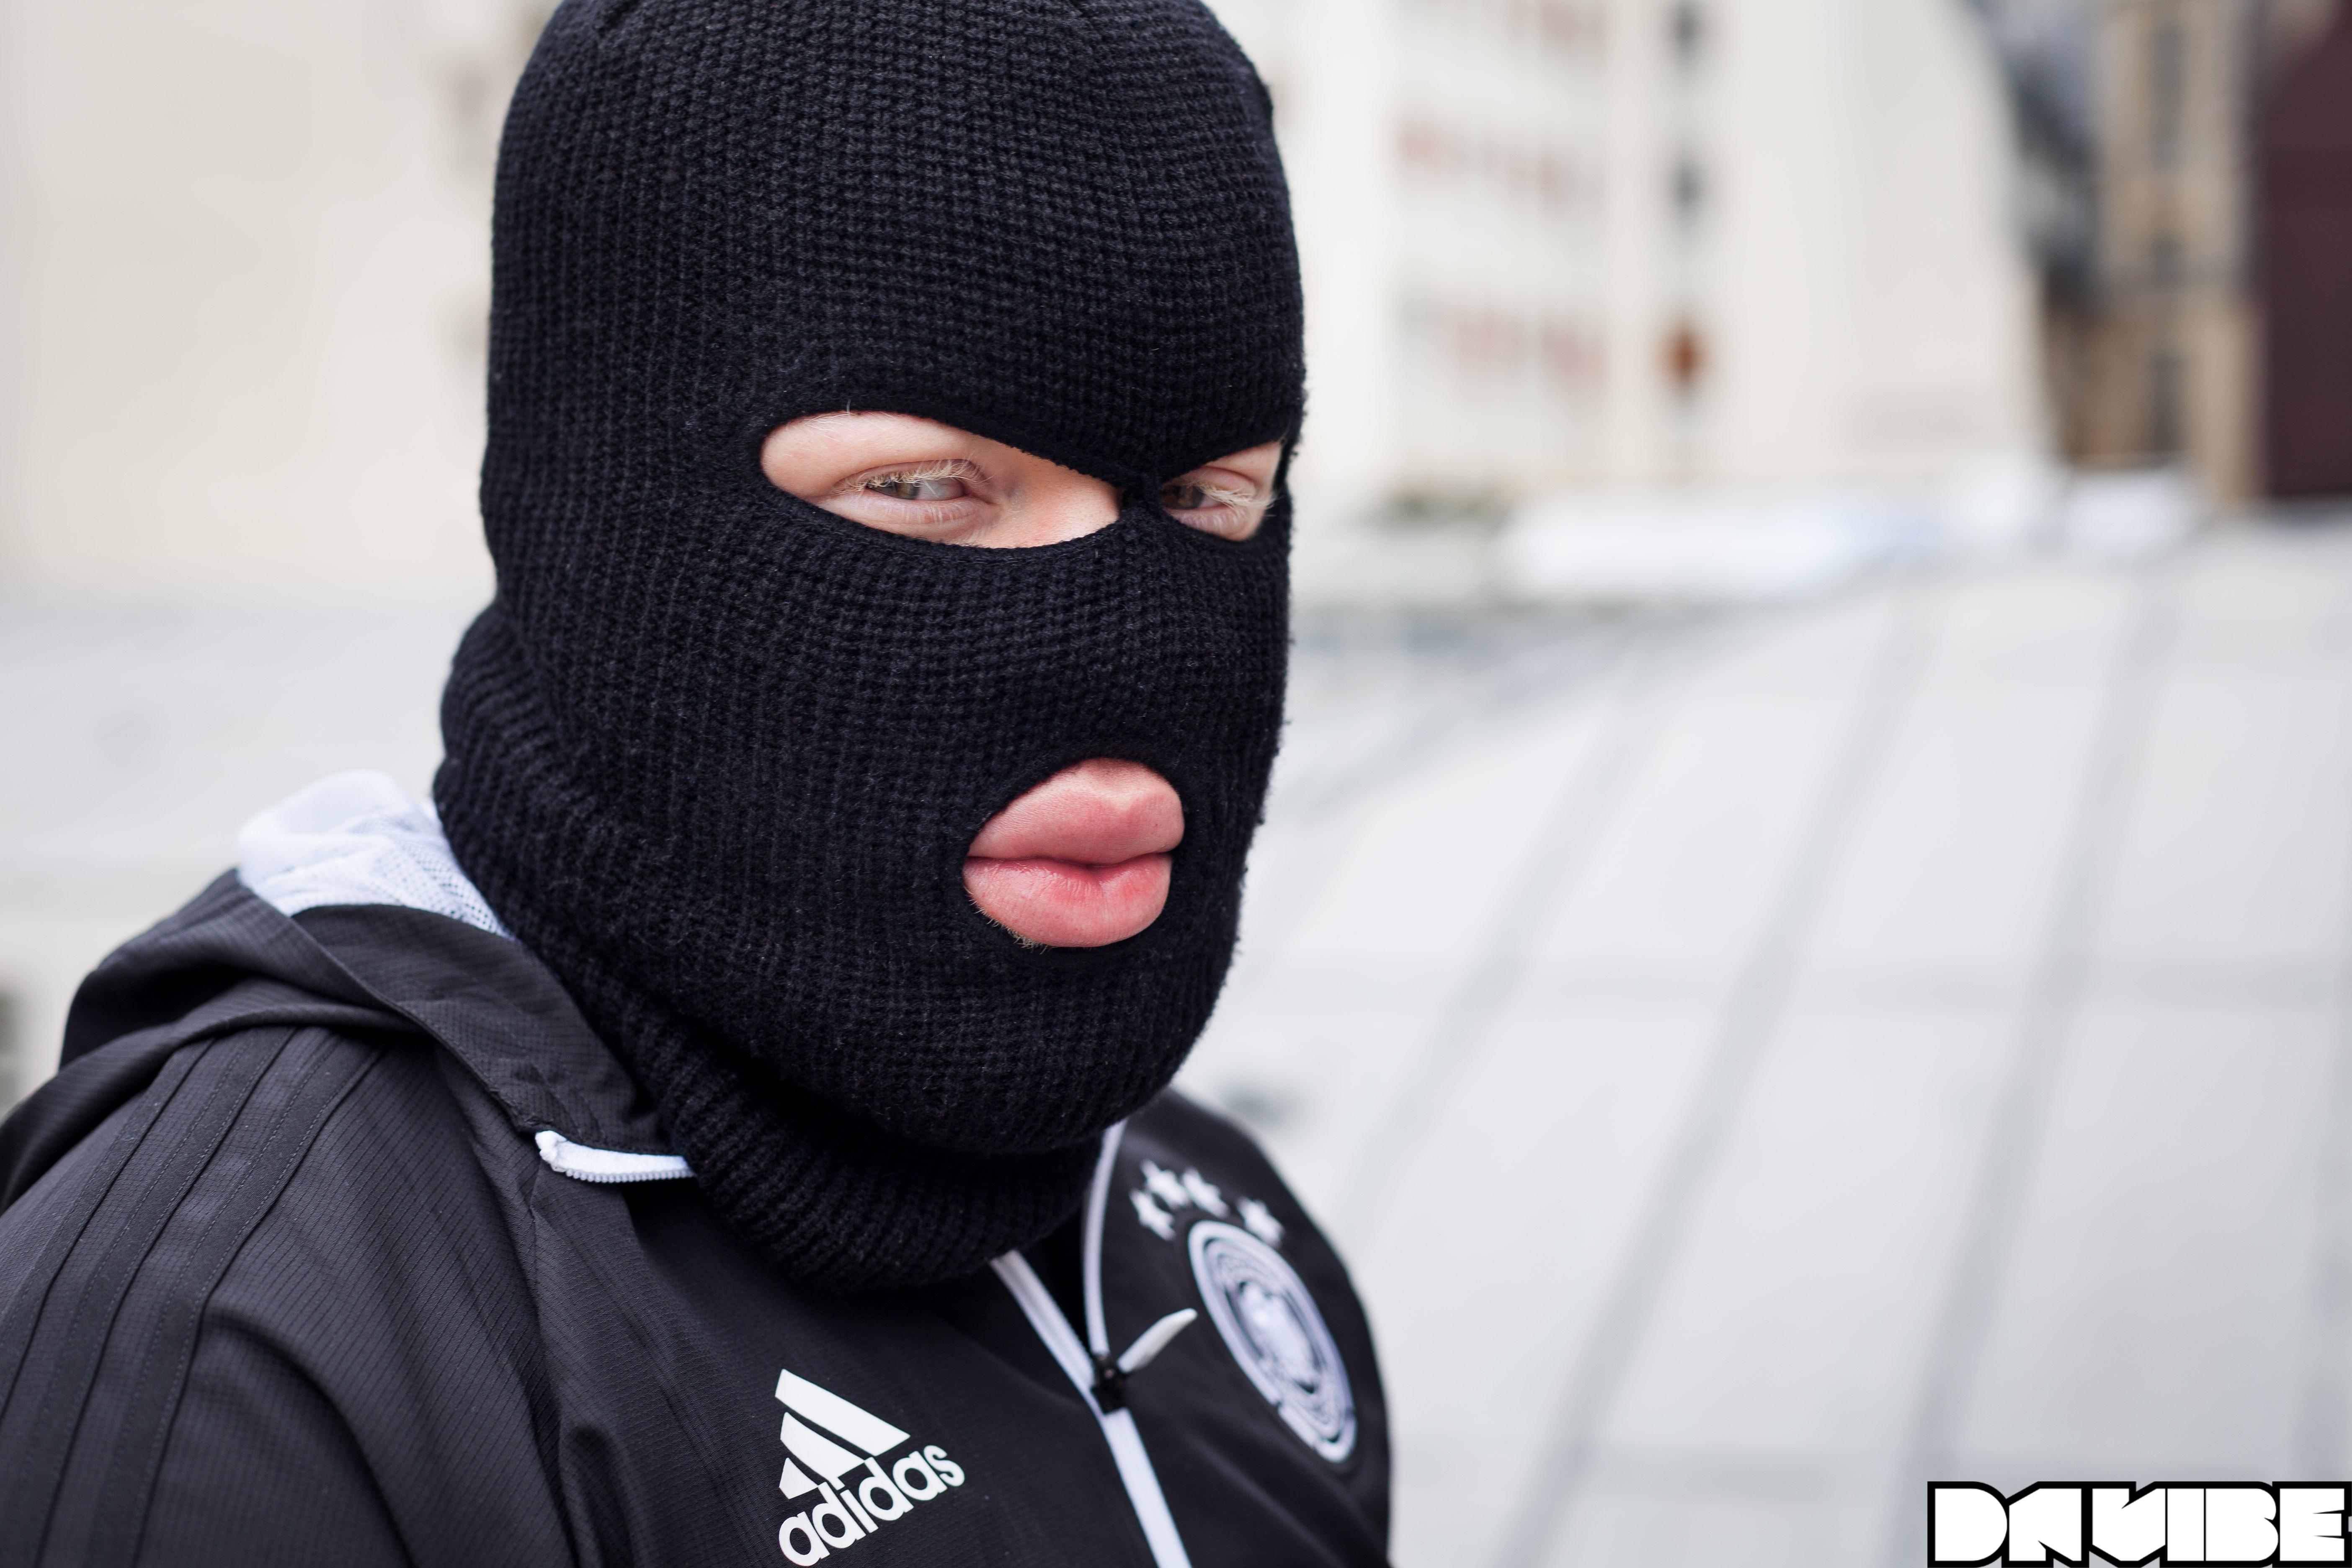 Kalash Criminel X Julien Gremm X Davibe (6)